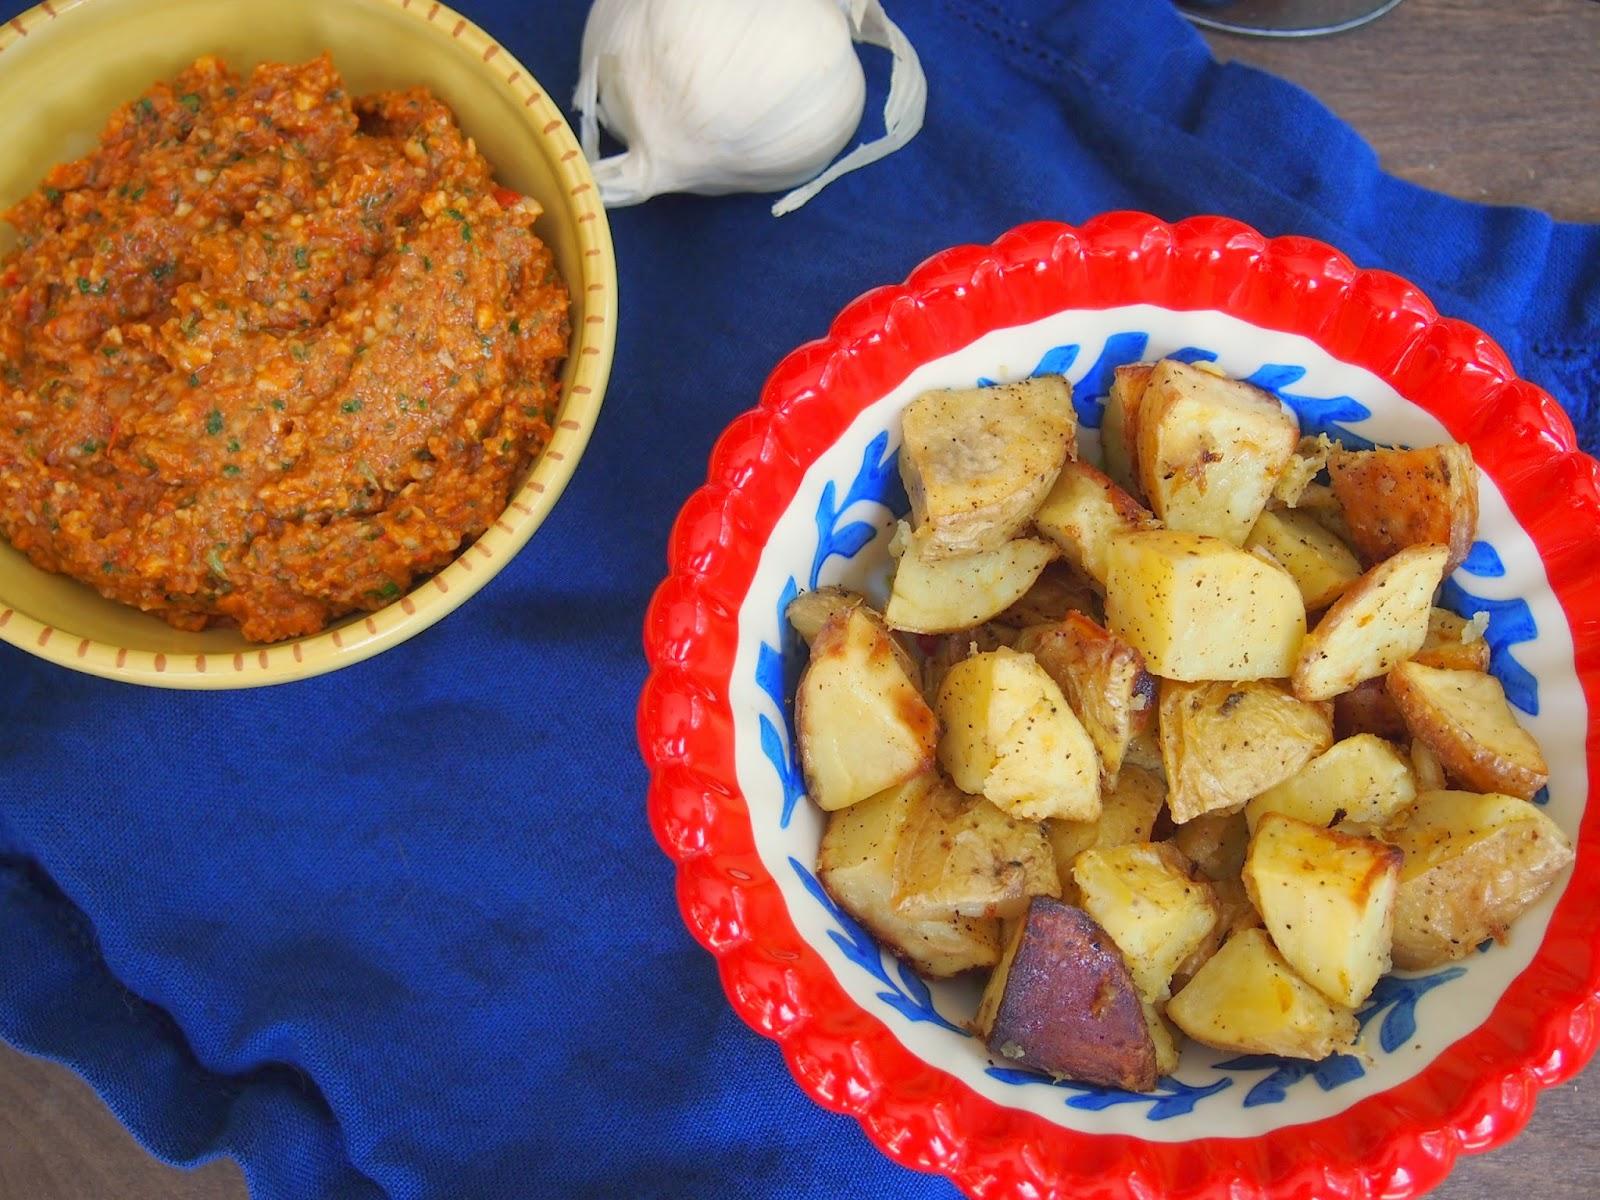 Roasted potatoes with romesco sauce